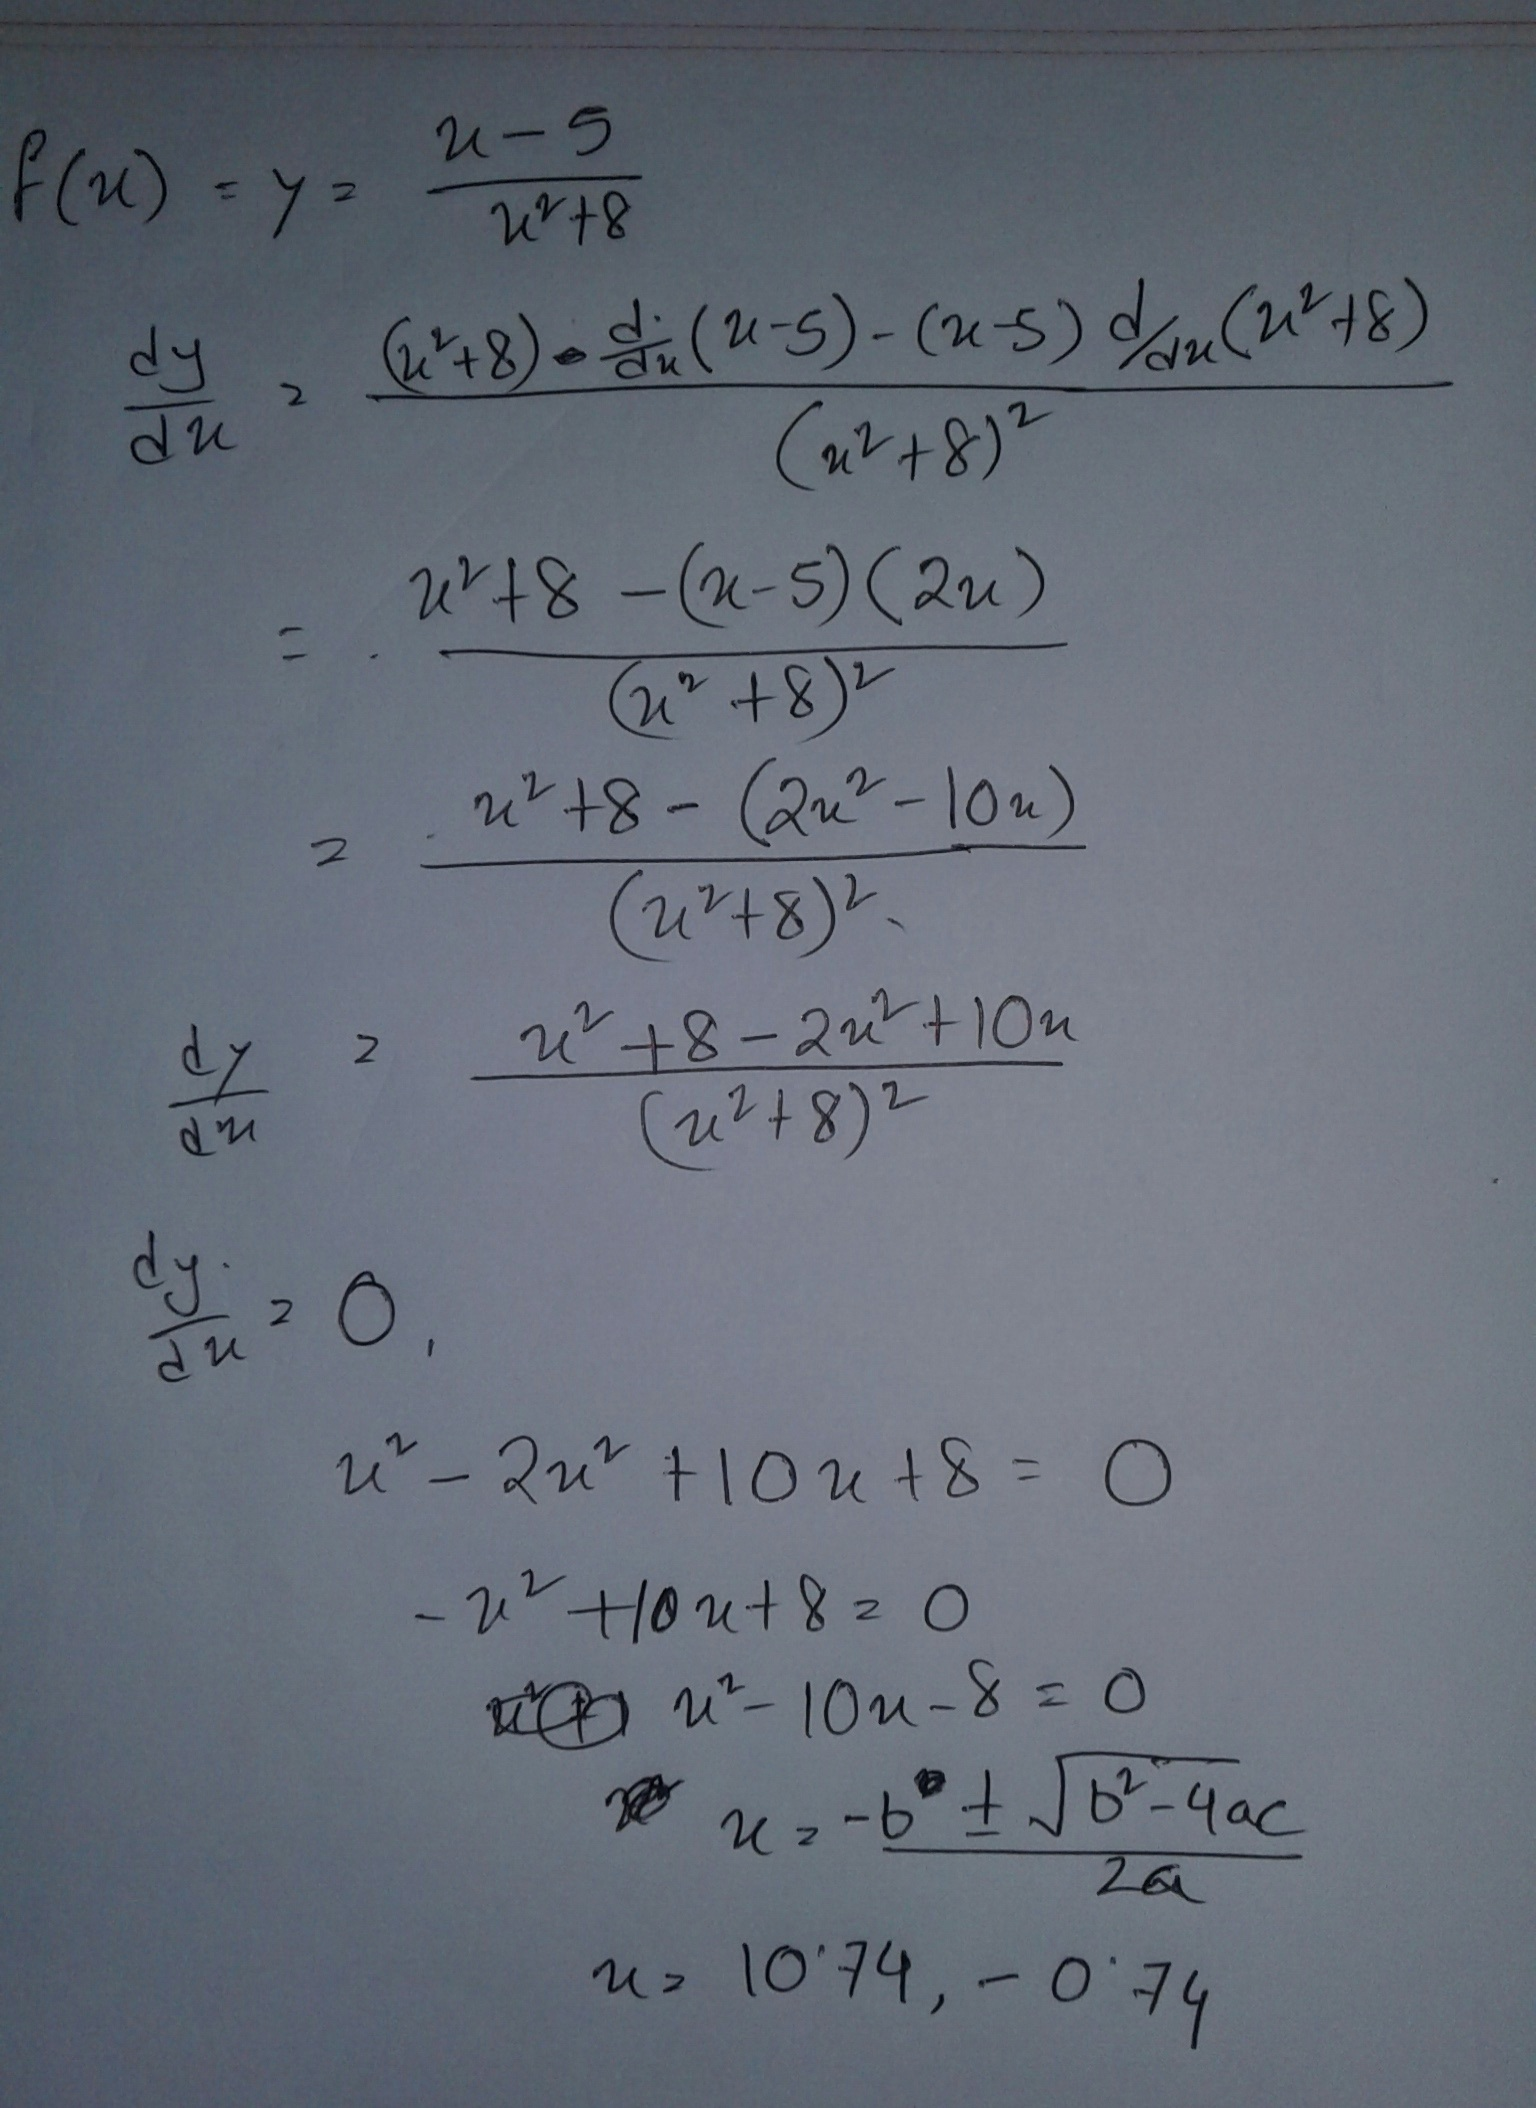 Kevin's math